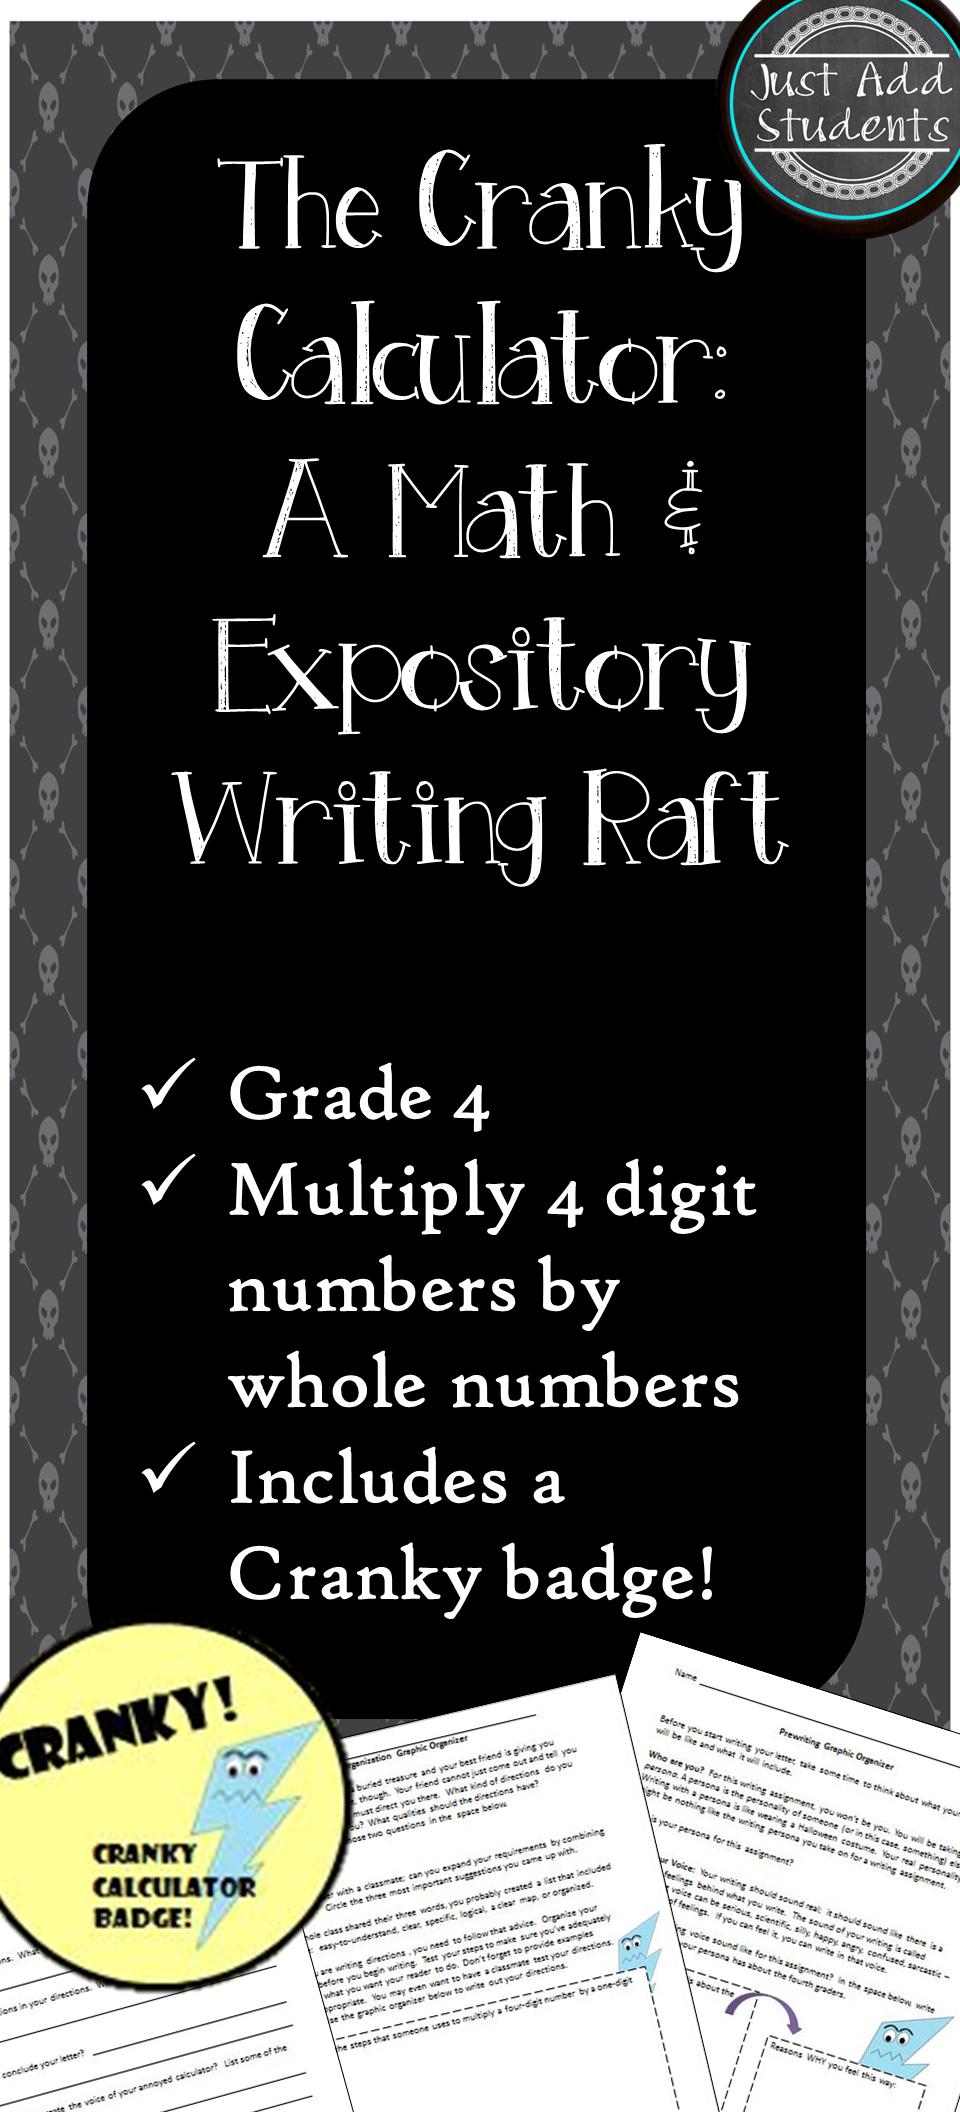 Expository Writing & Math RAFT Expository writing